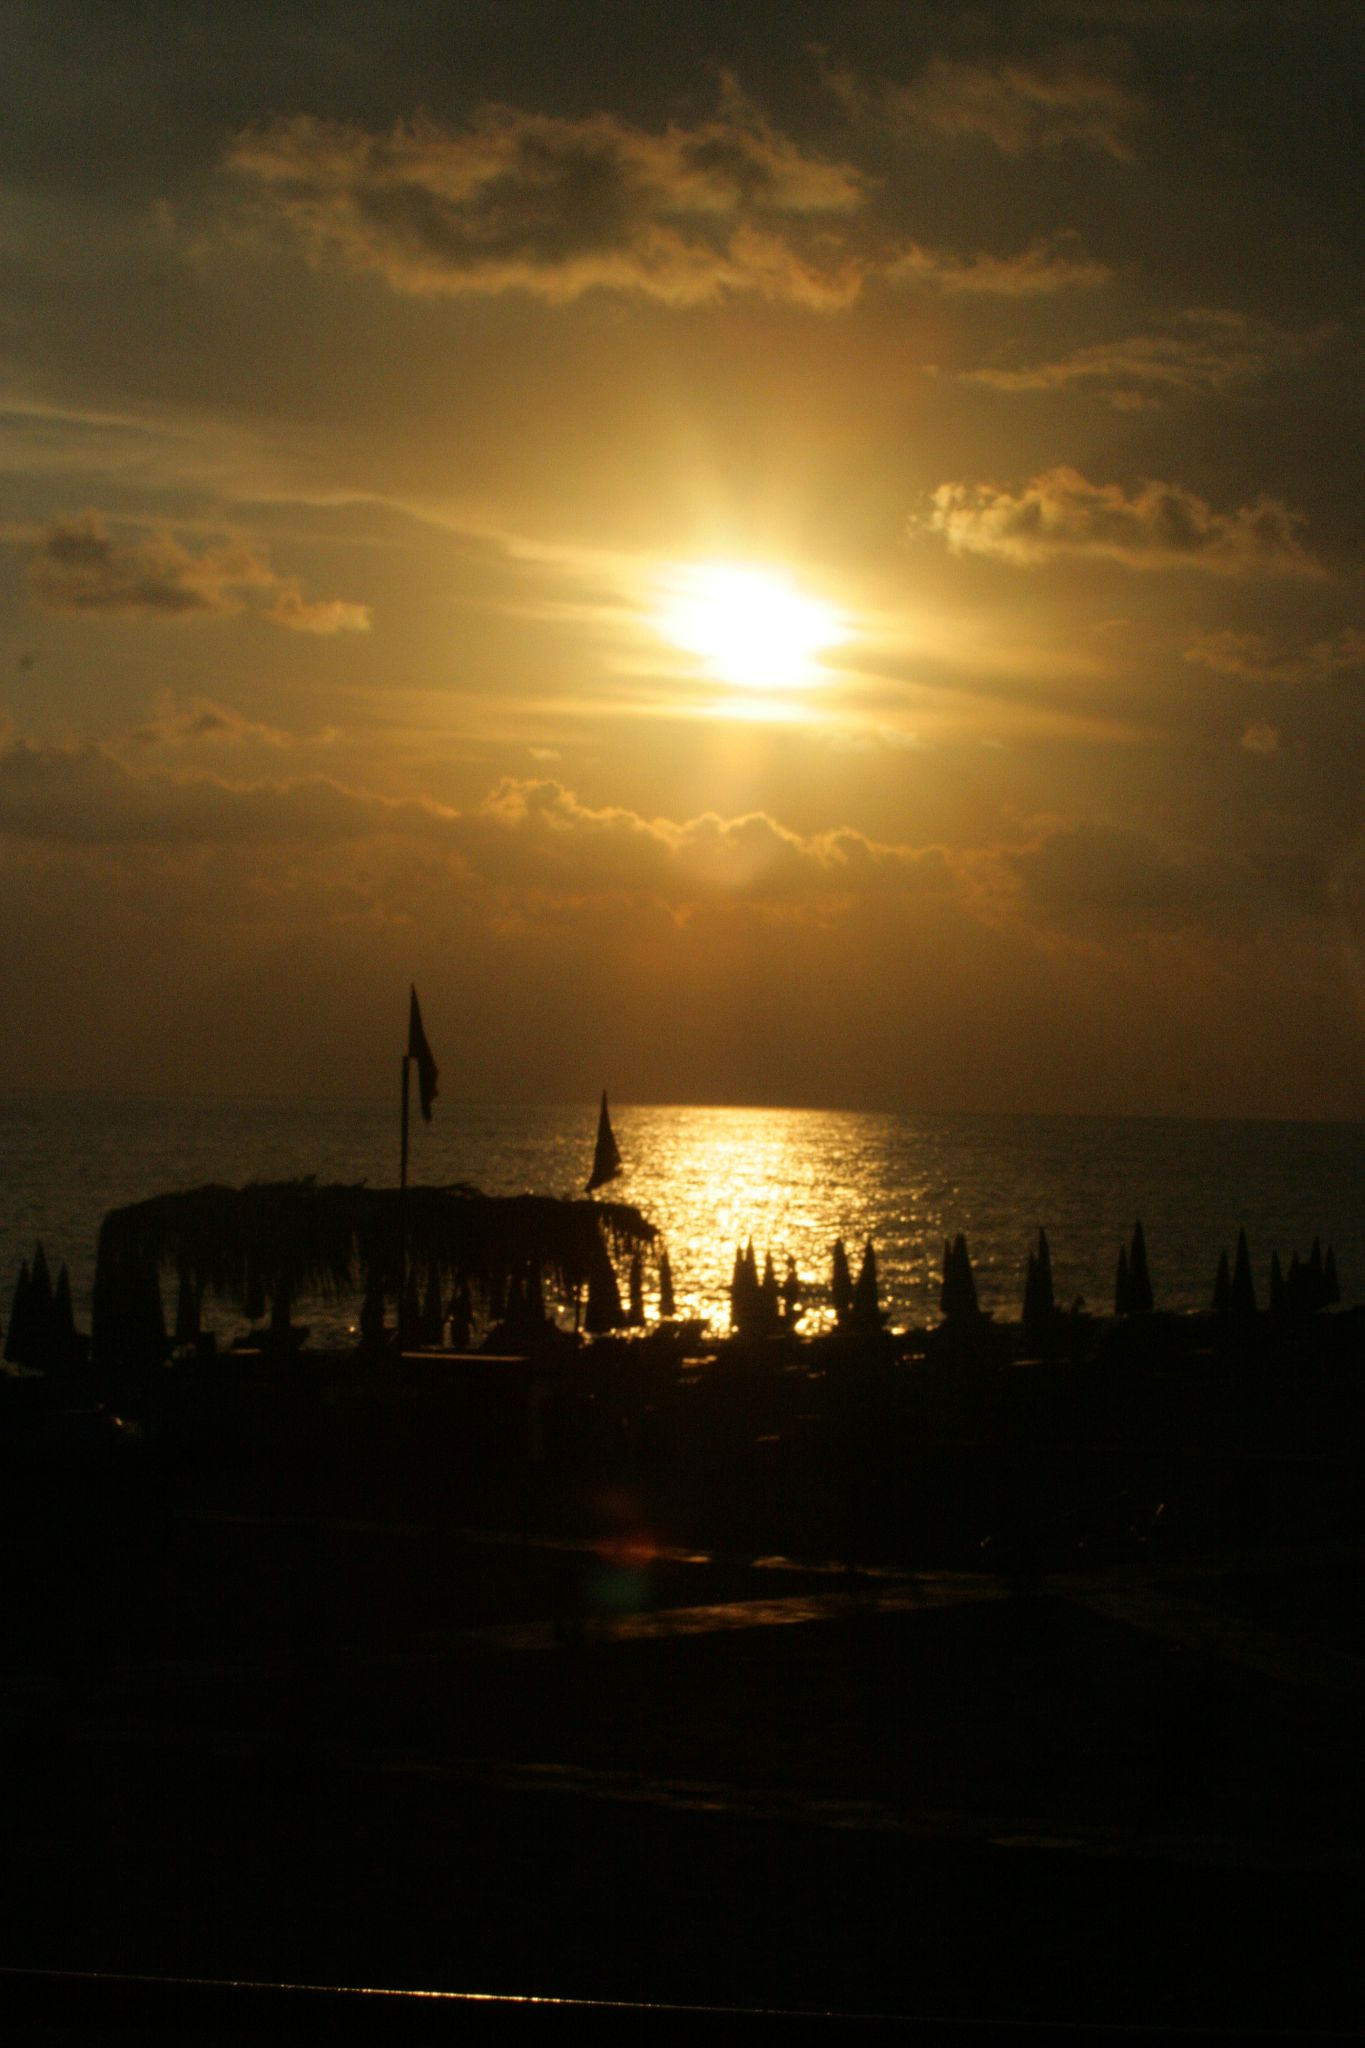 Evening ! by monanorrman